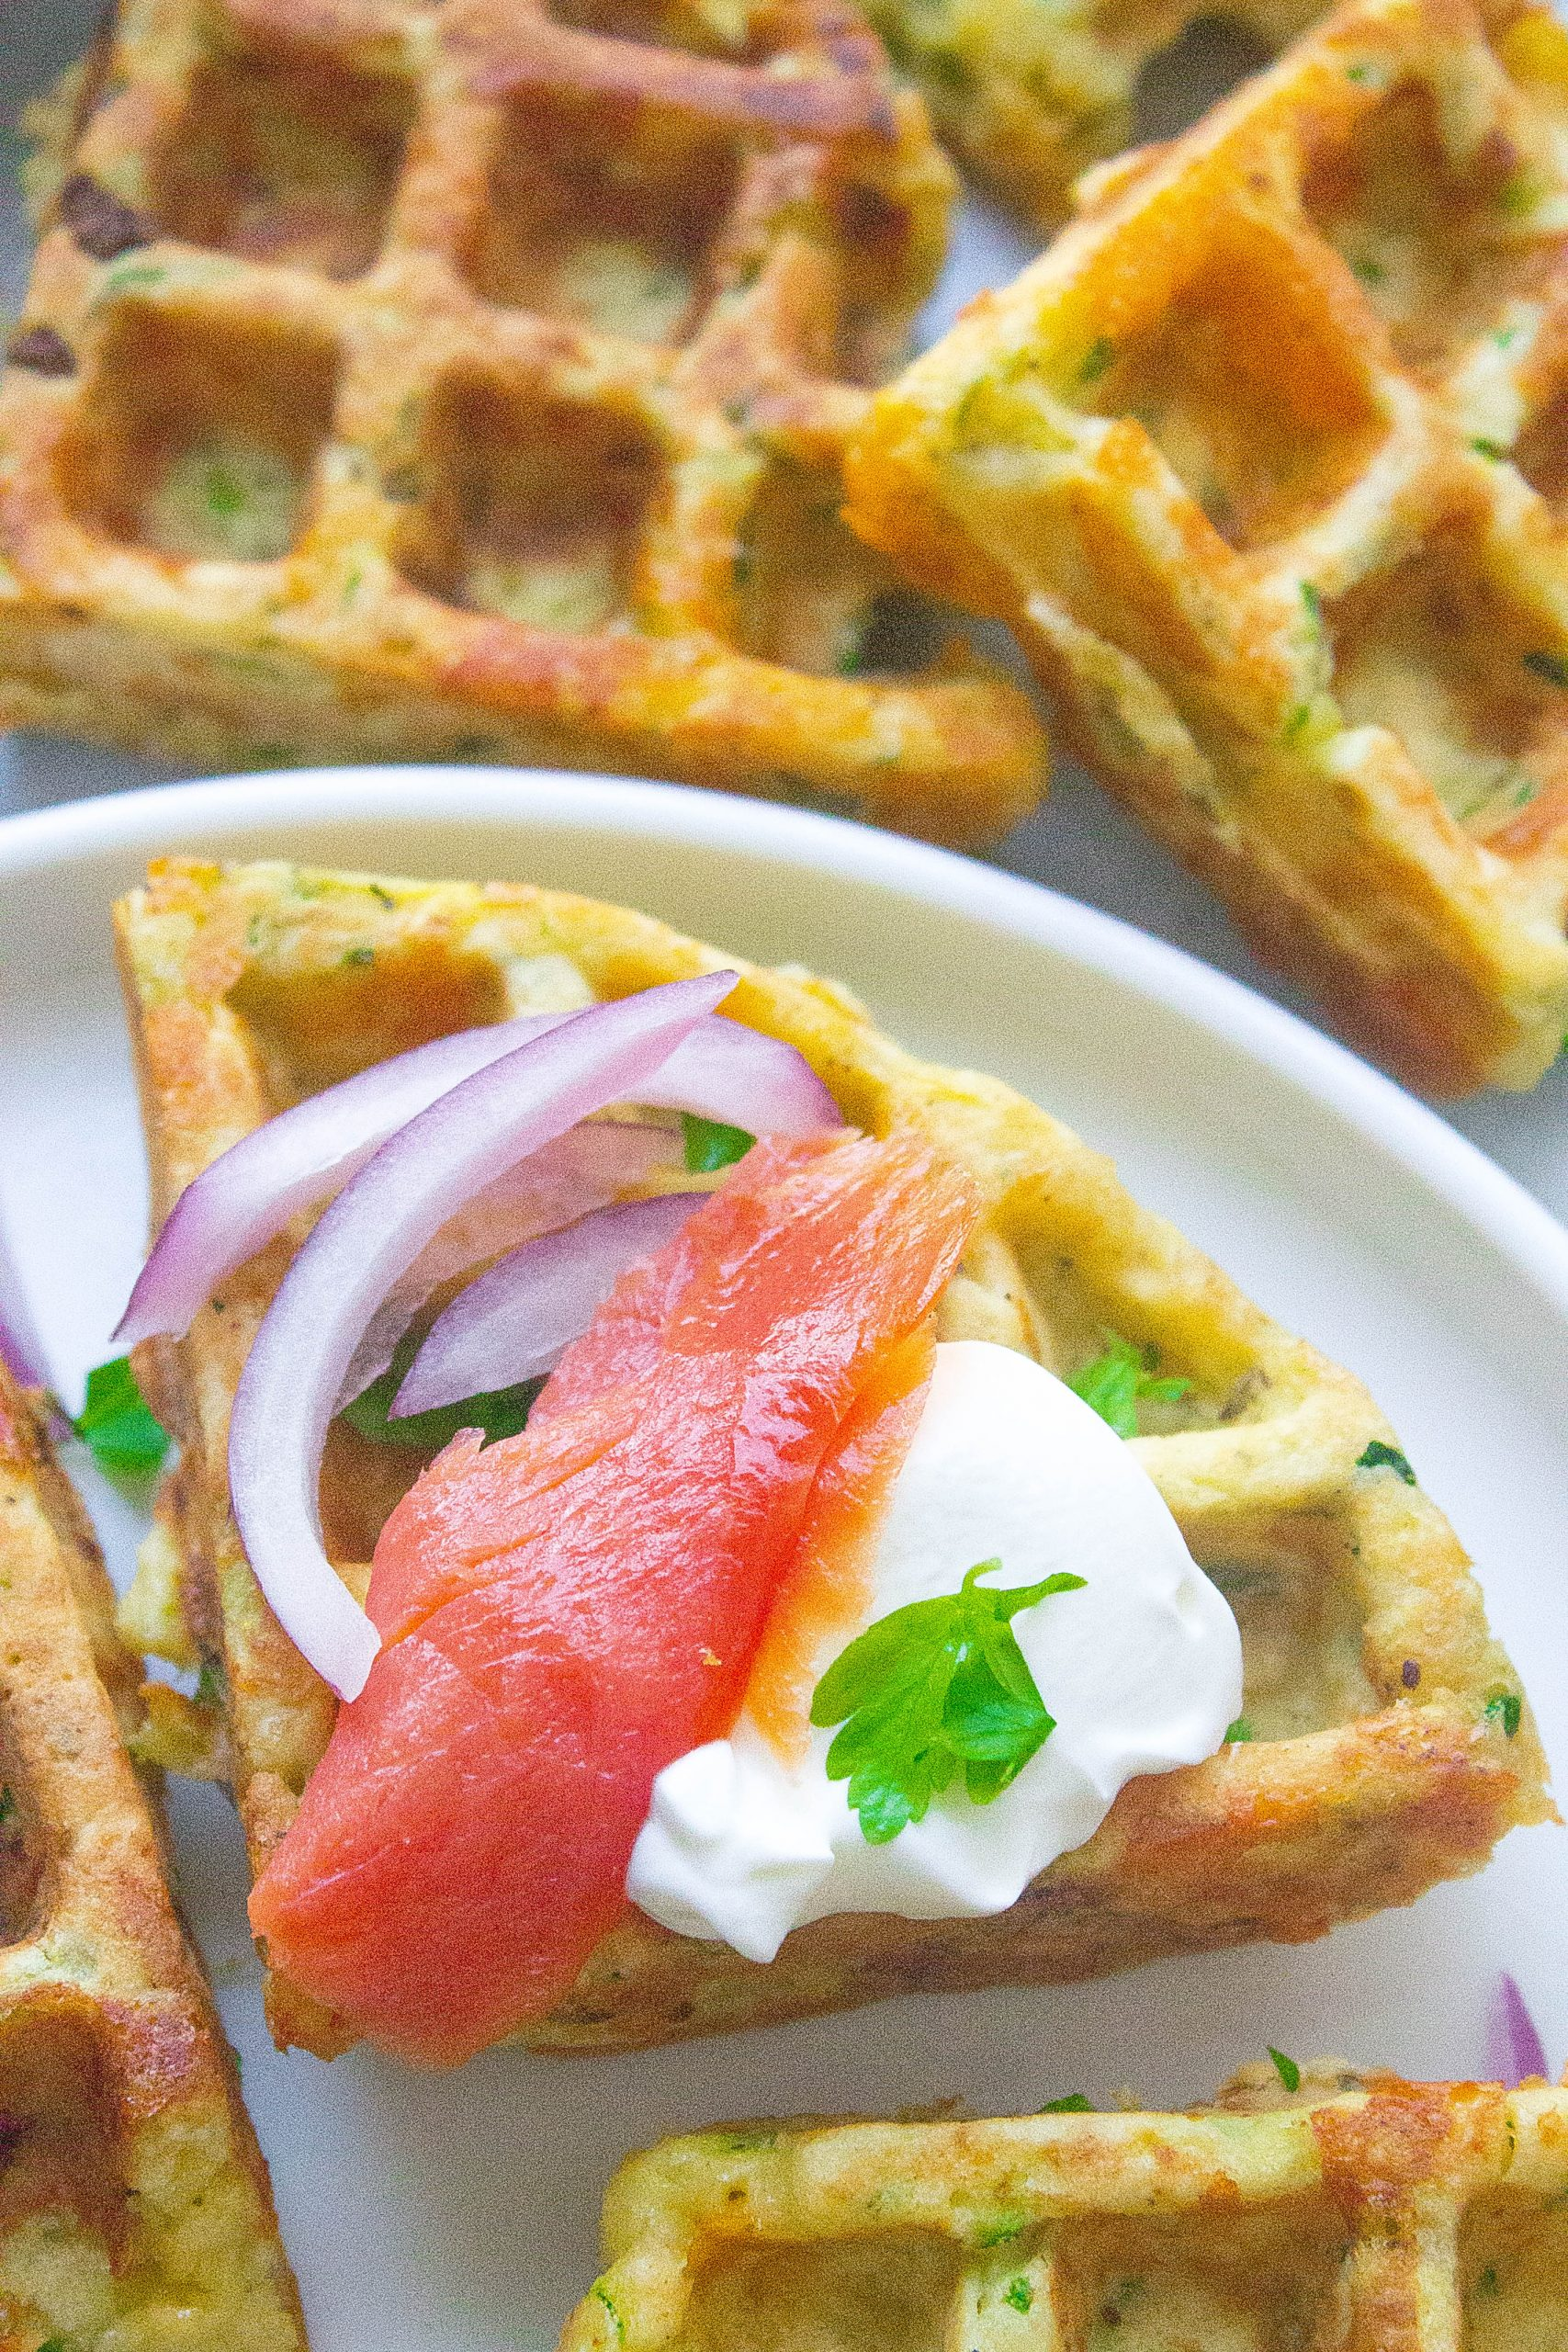 Zucchini Cheddar Waffles with salmon